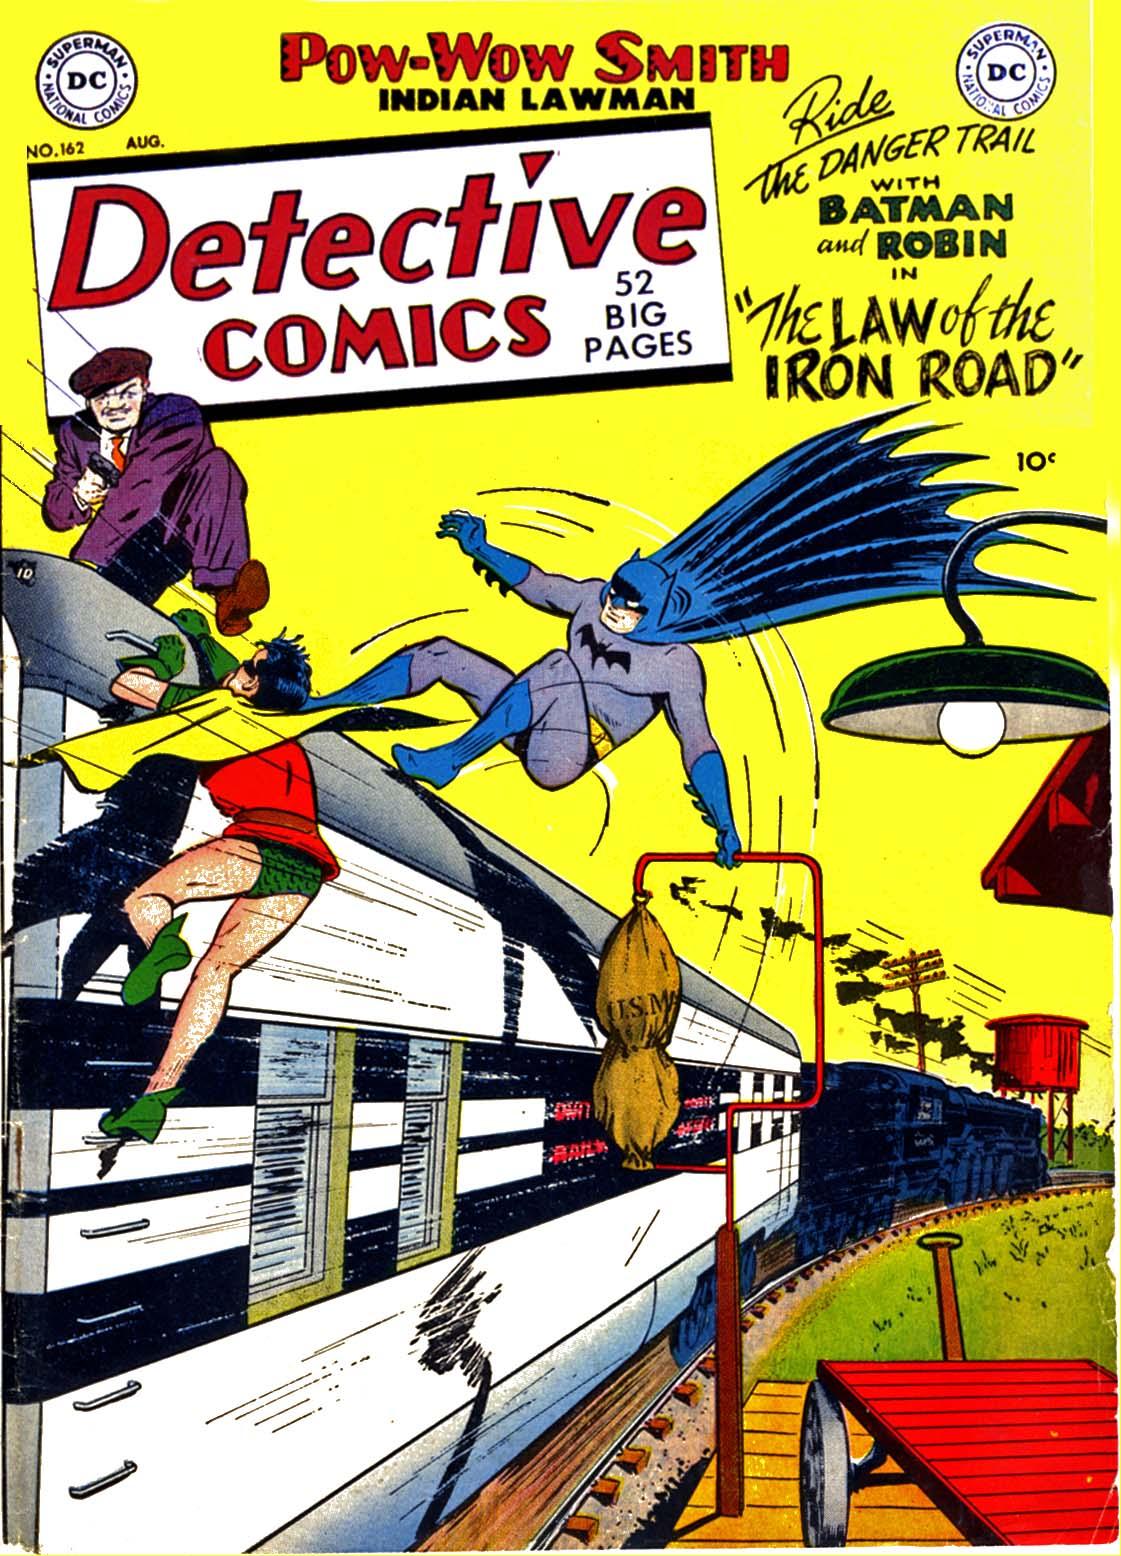 Read online Detective Comics (1937) comic -  Issue #162 - 1